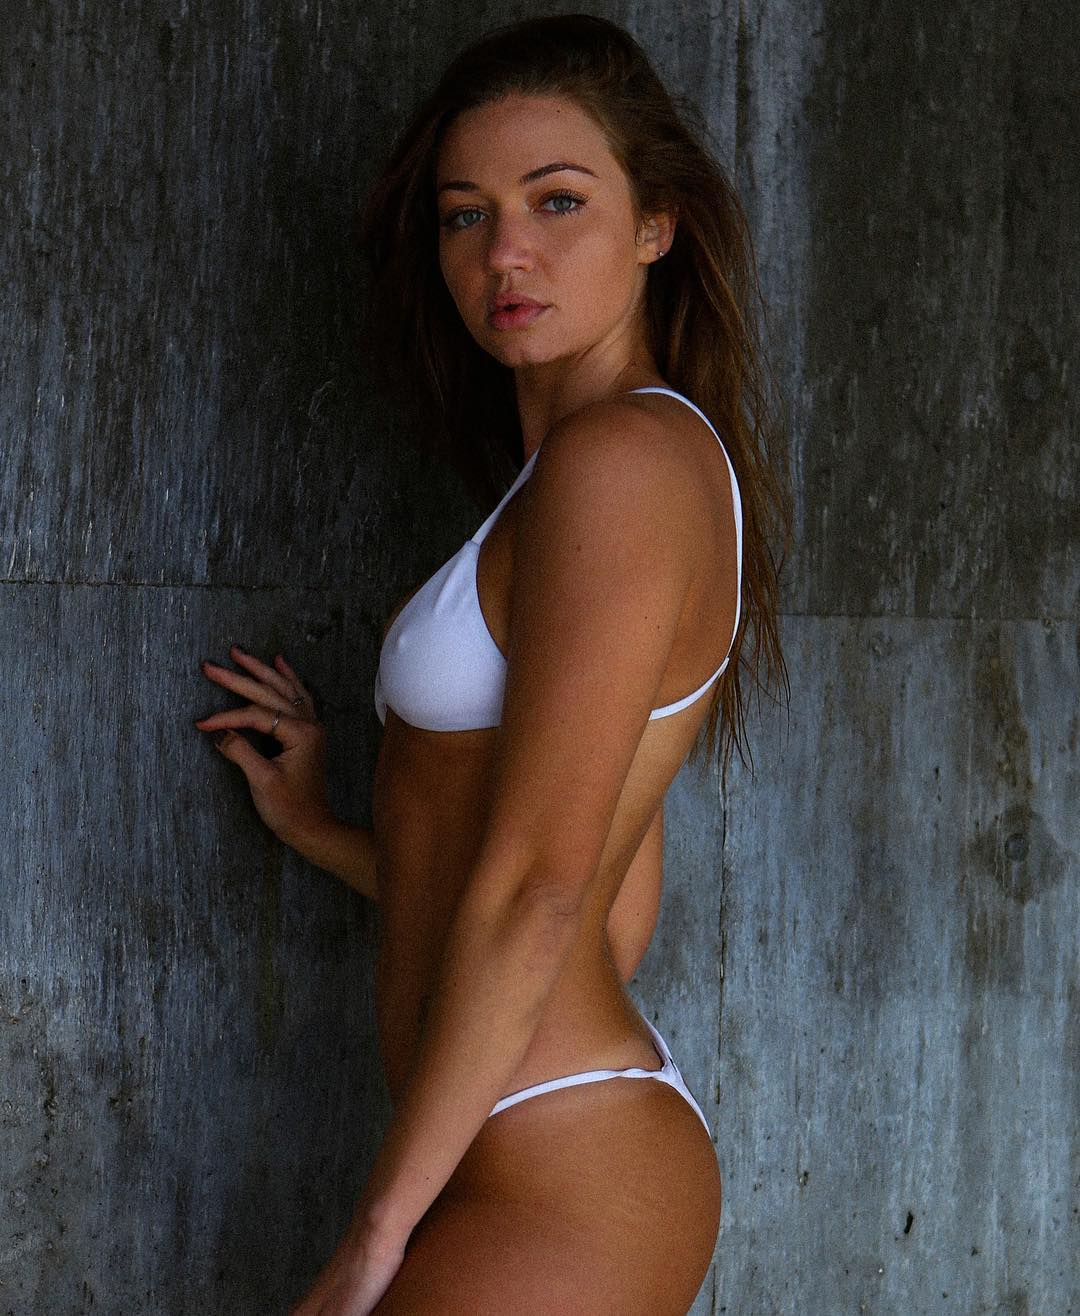 Nude erika costell Erika Costell